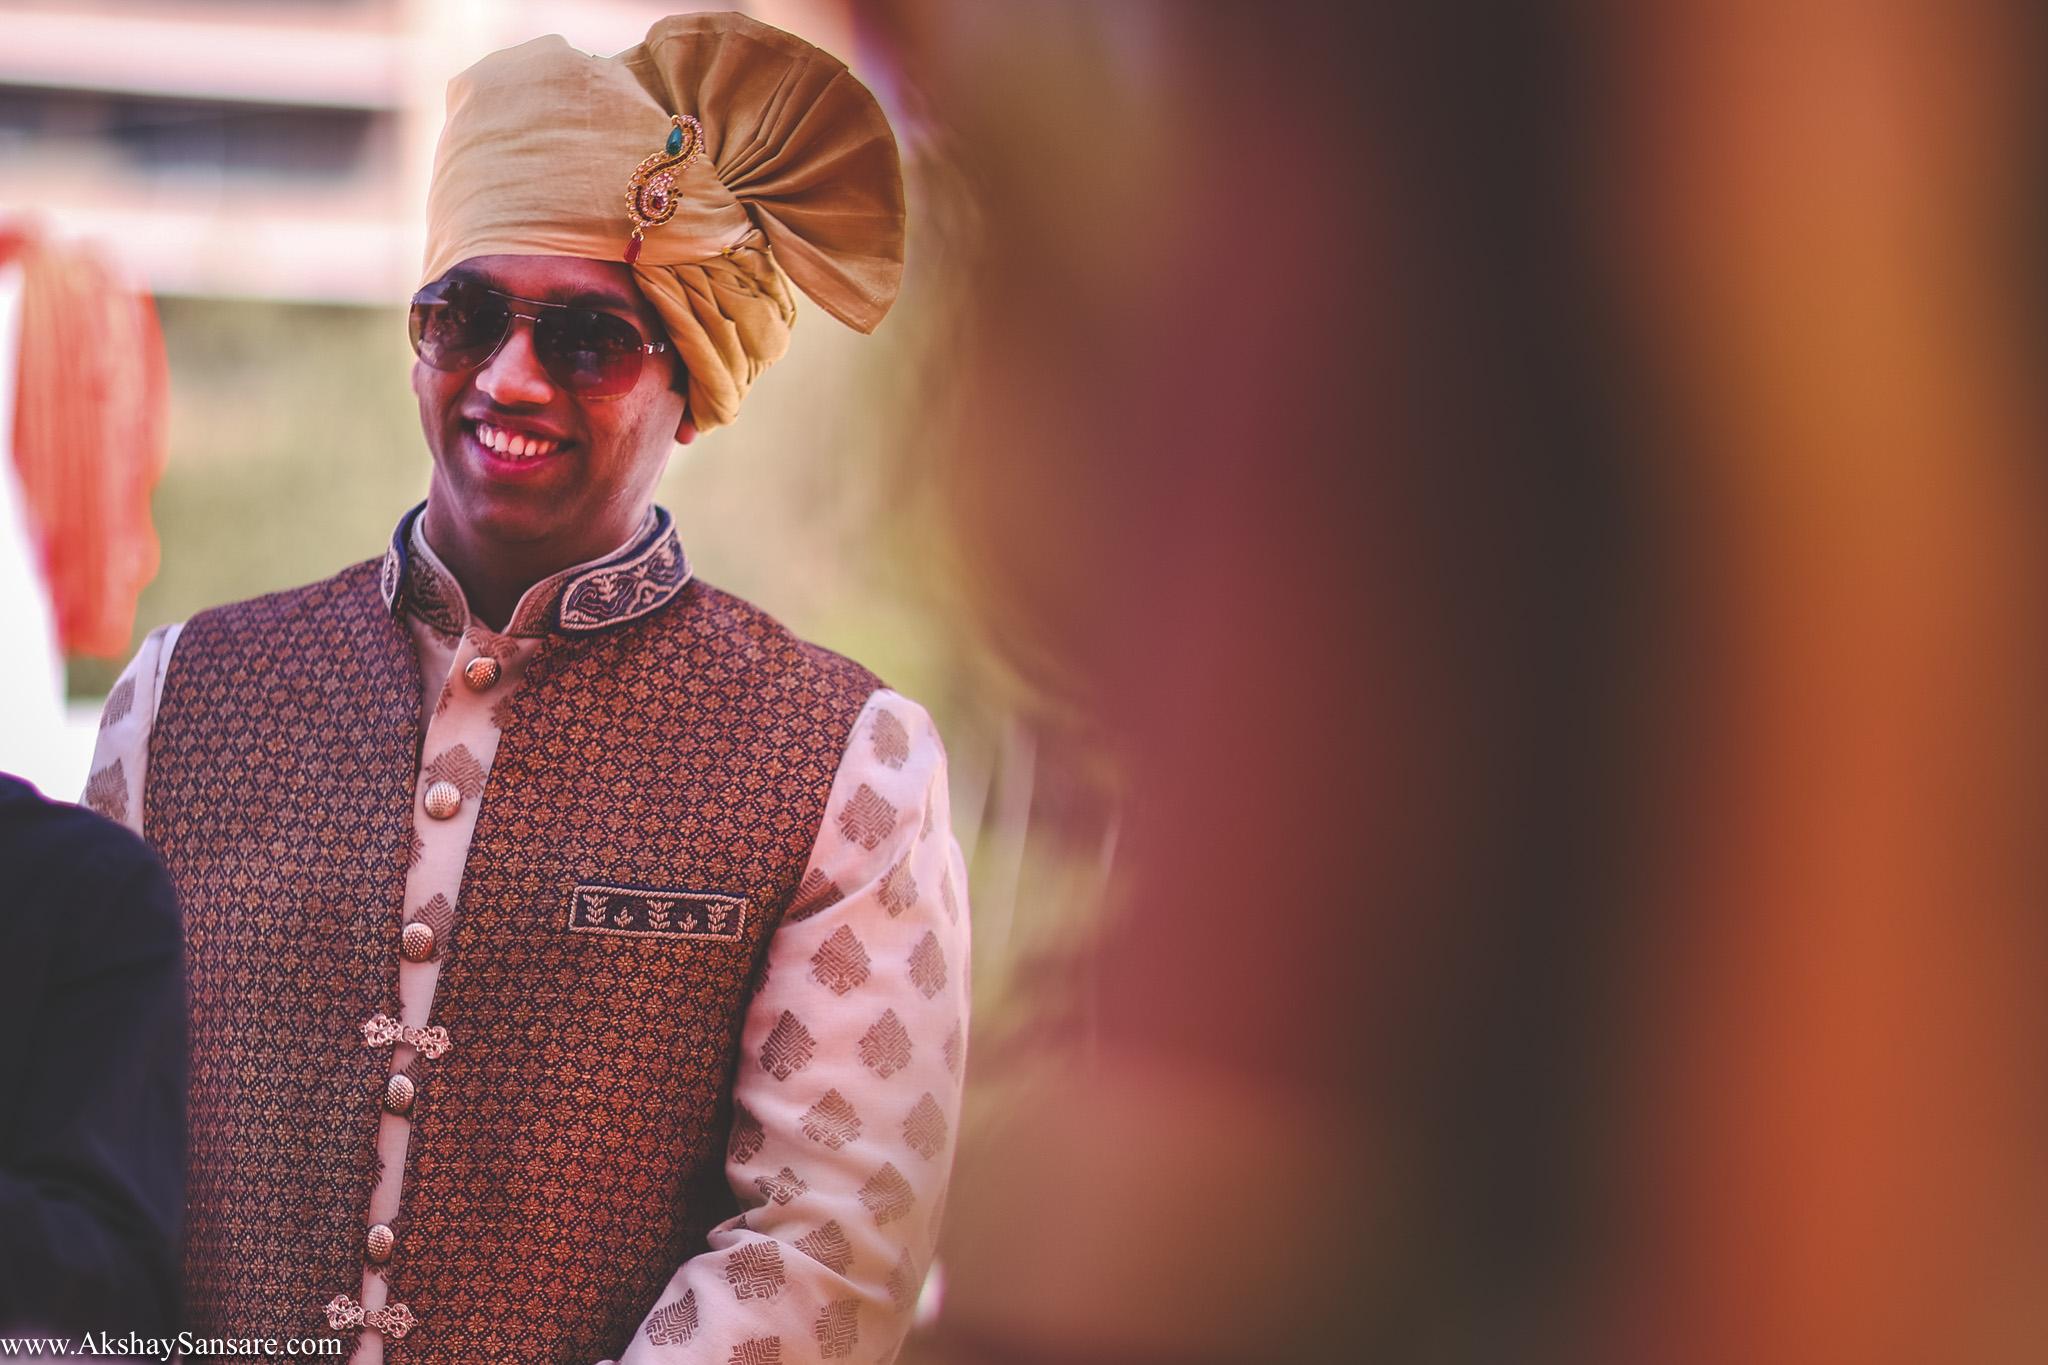 Salil x Kimaya Akshay Sansare Photography Candid wedding Photographer in mumbai best(7).jpg